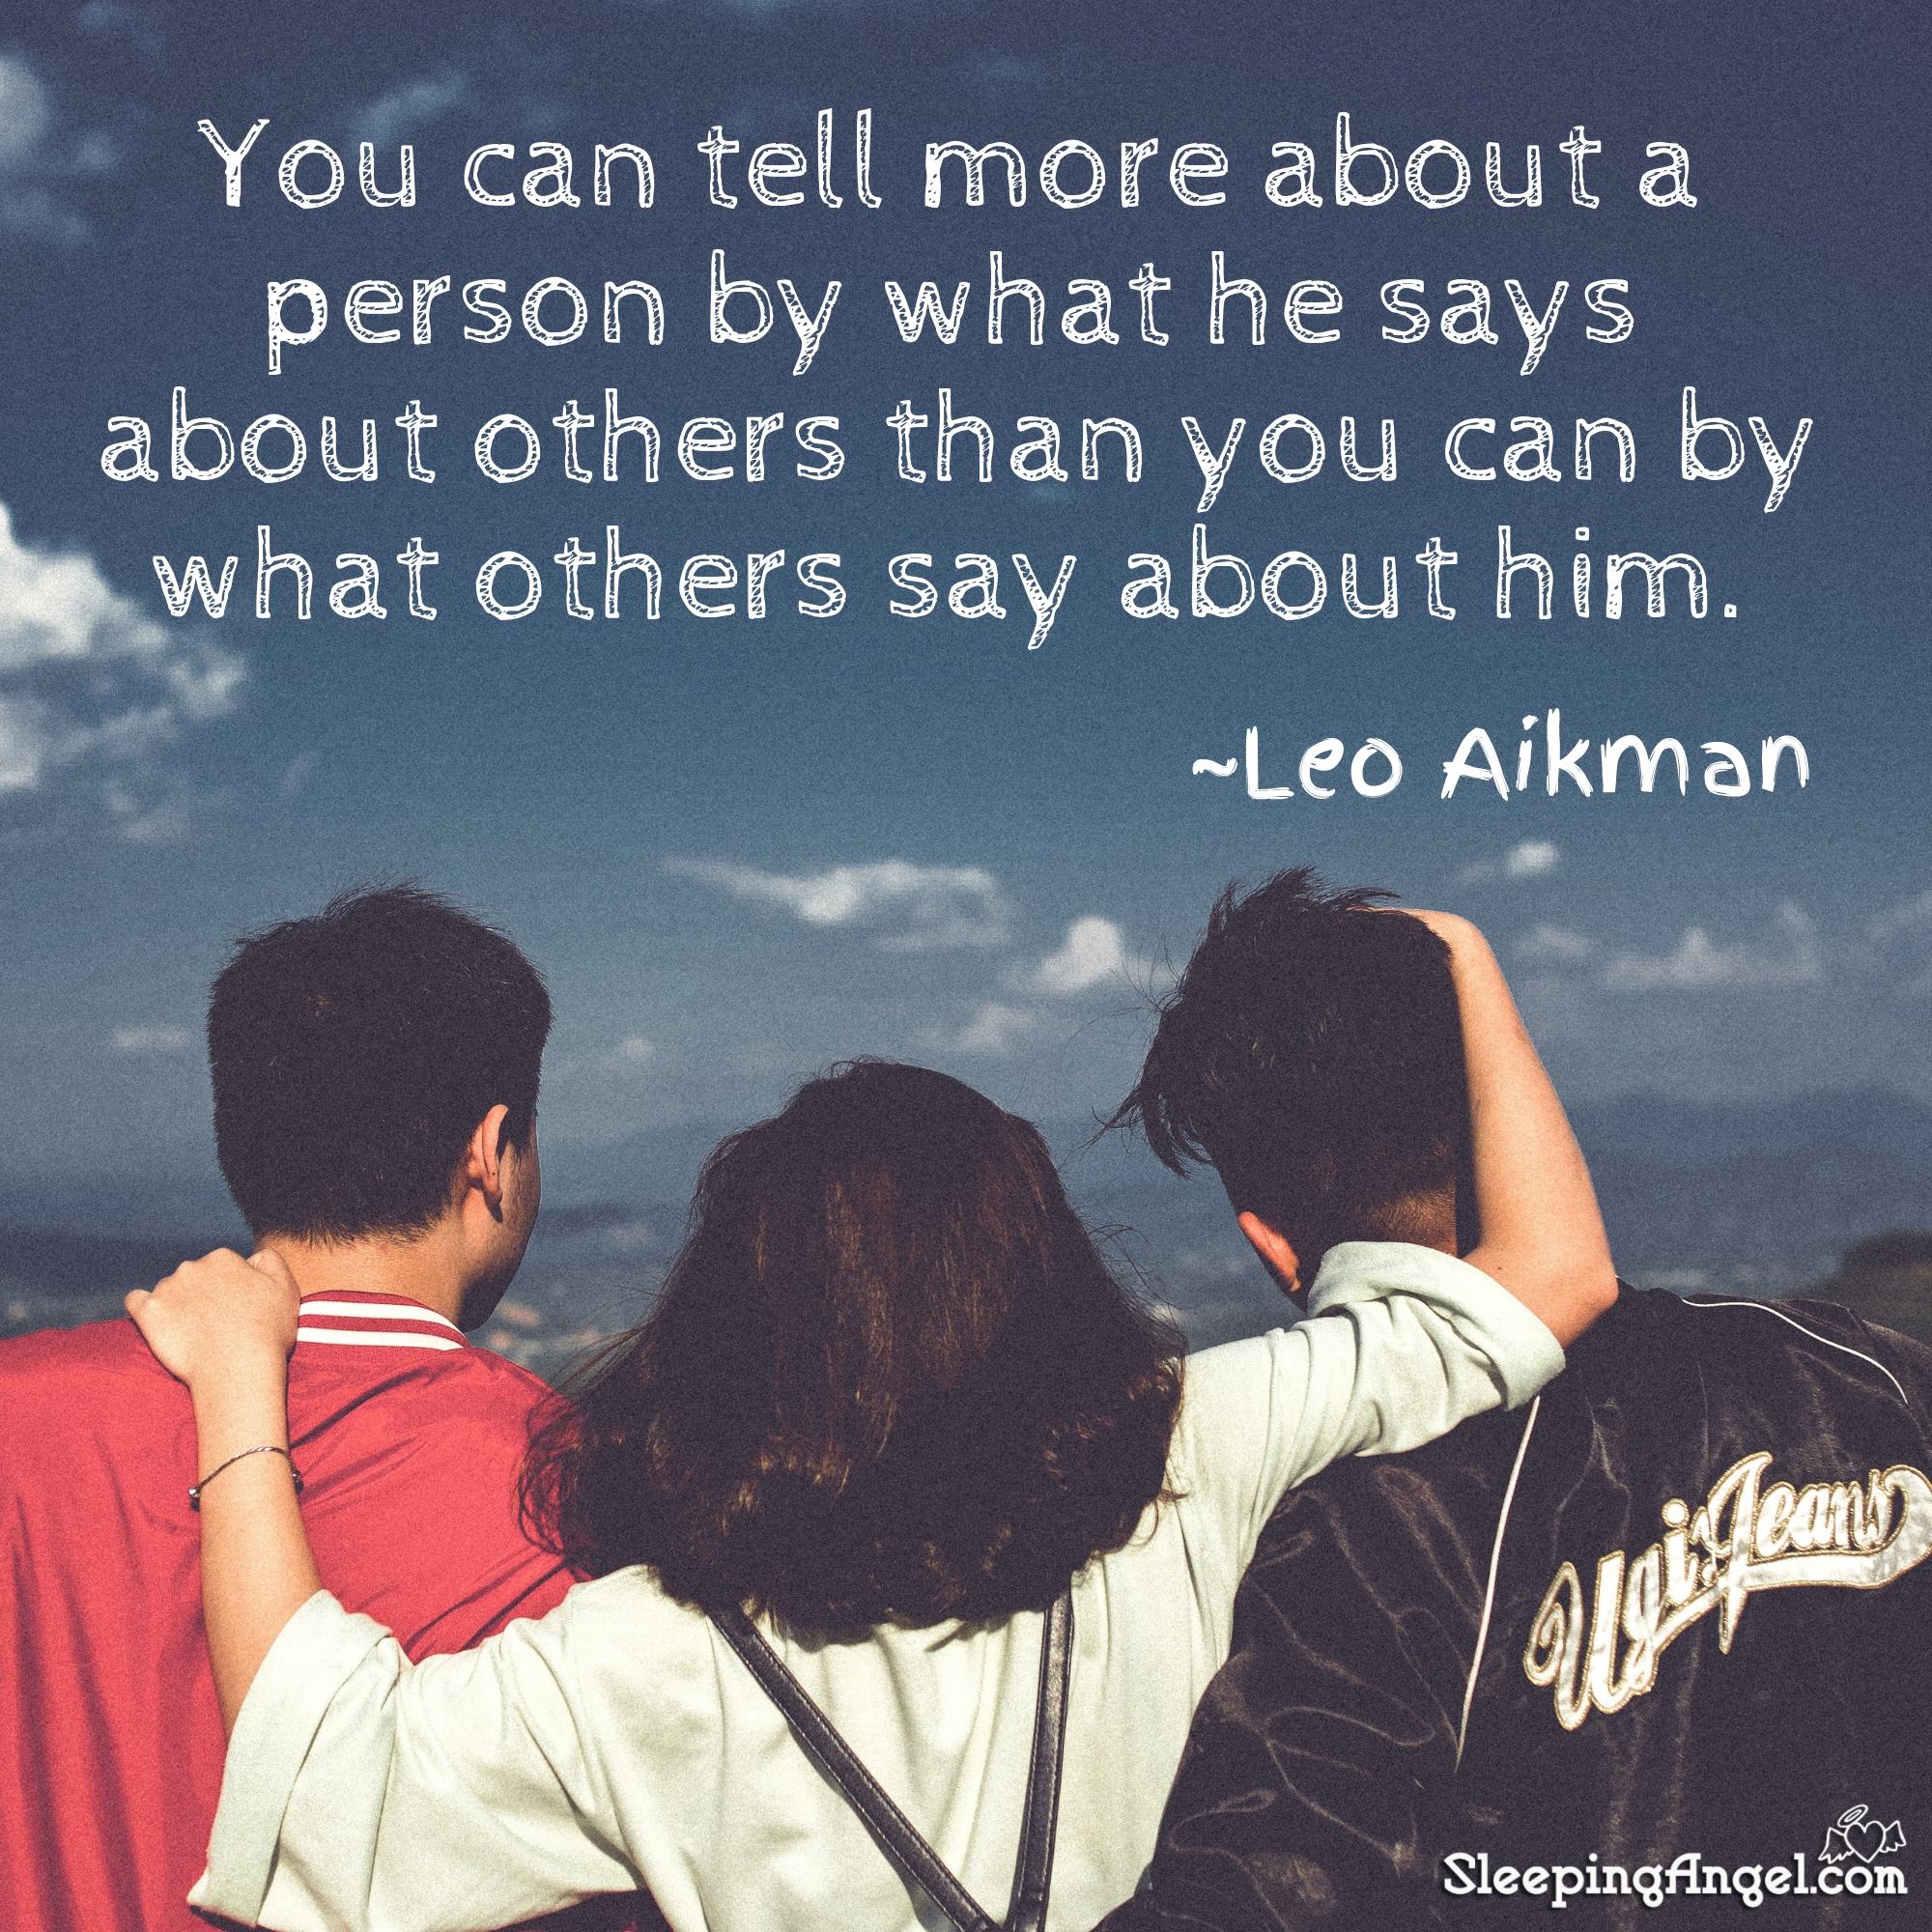 Leo Aikman Quote